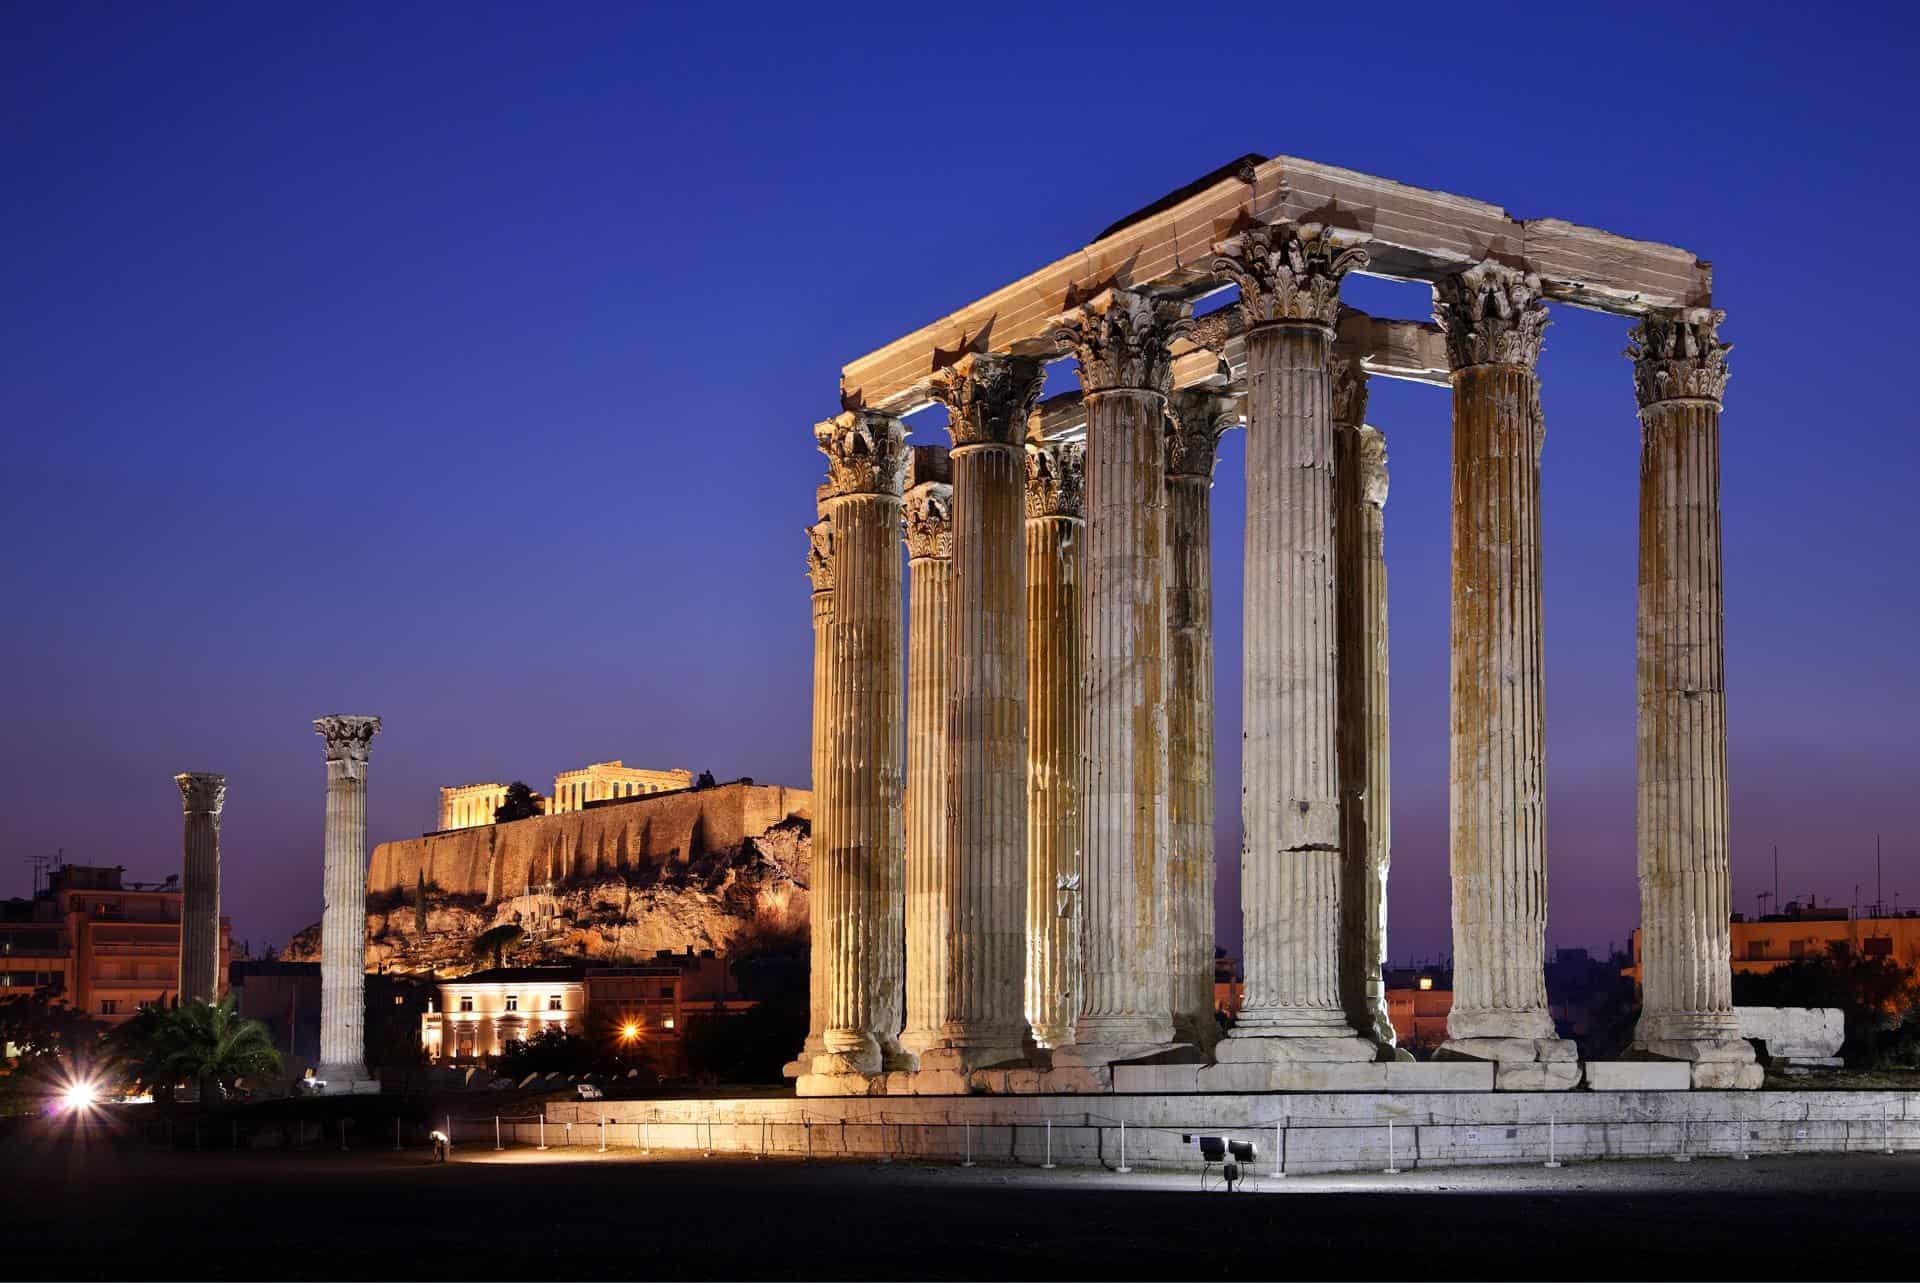 Temple of Olympian Zeus at night